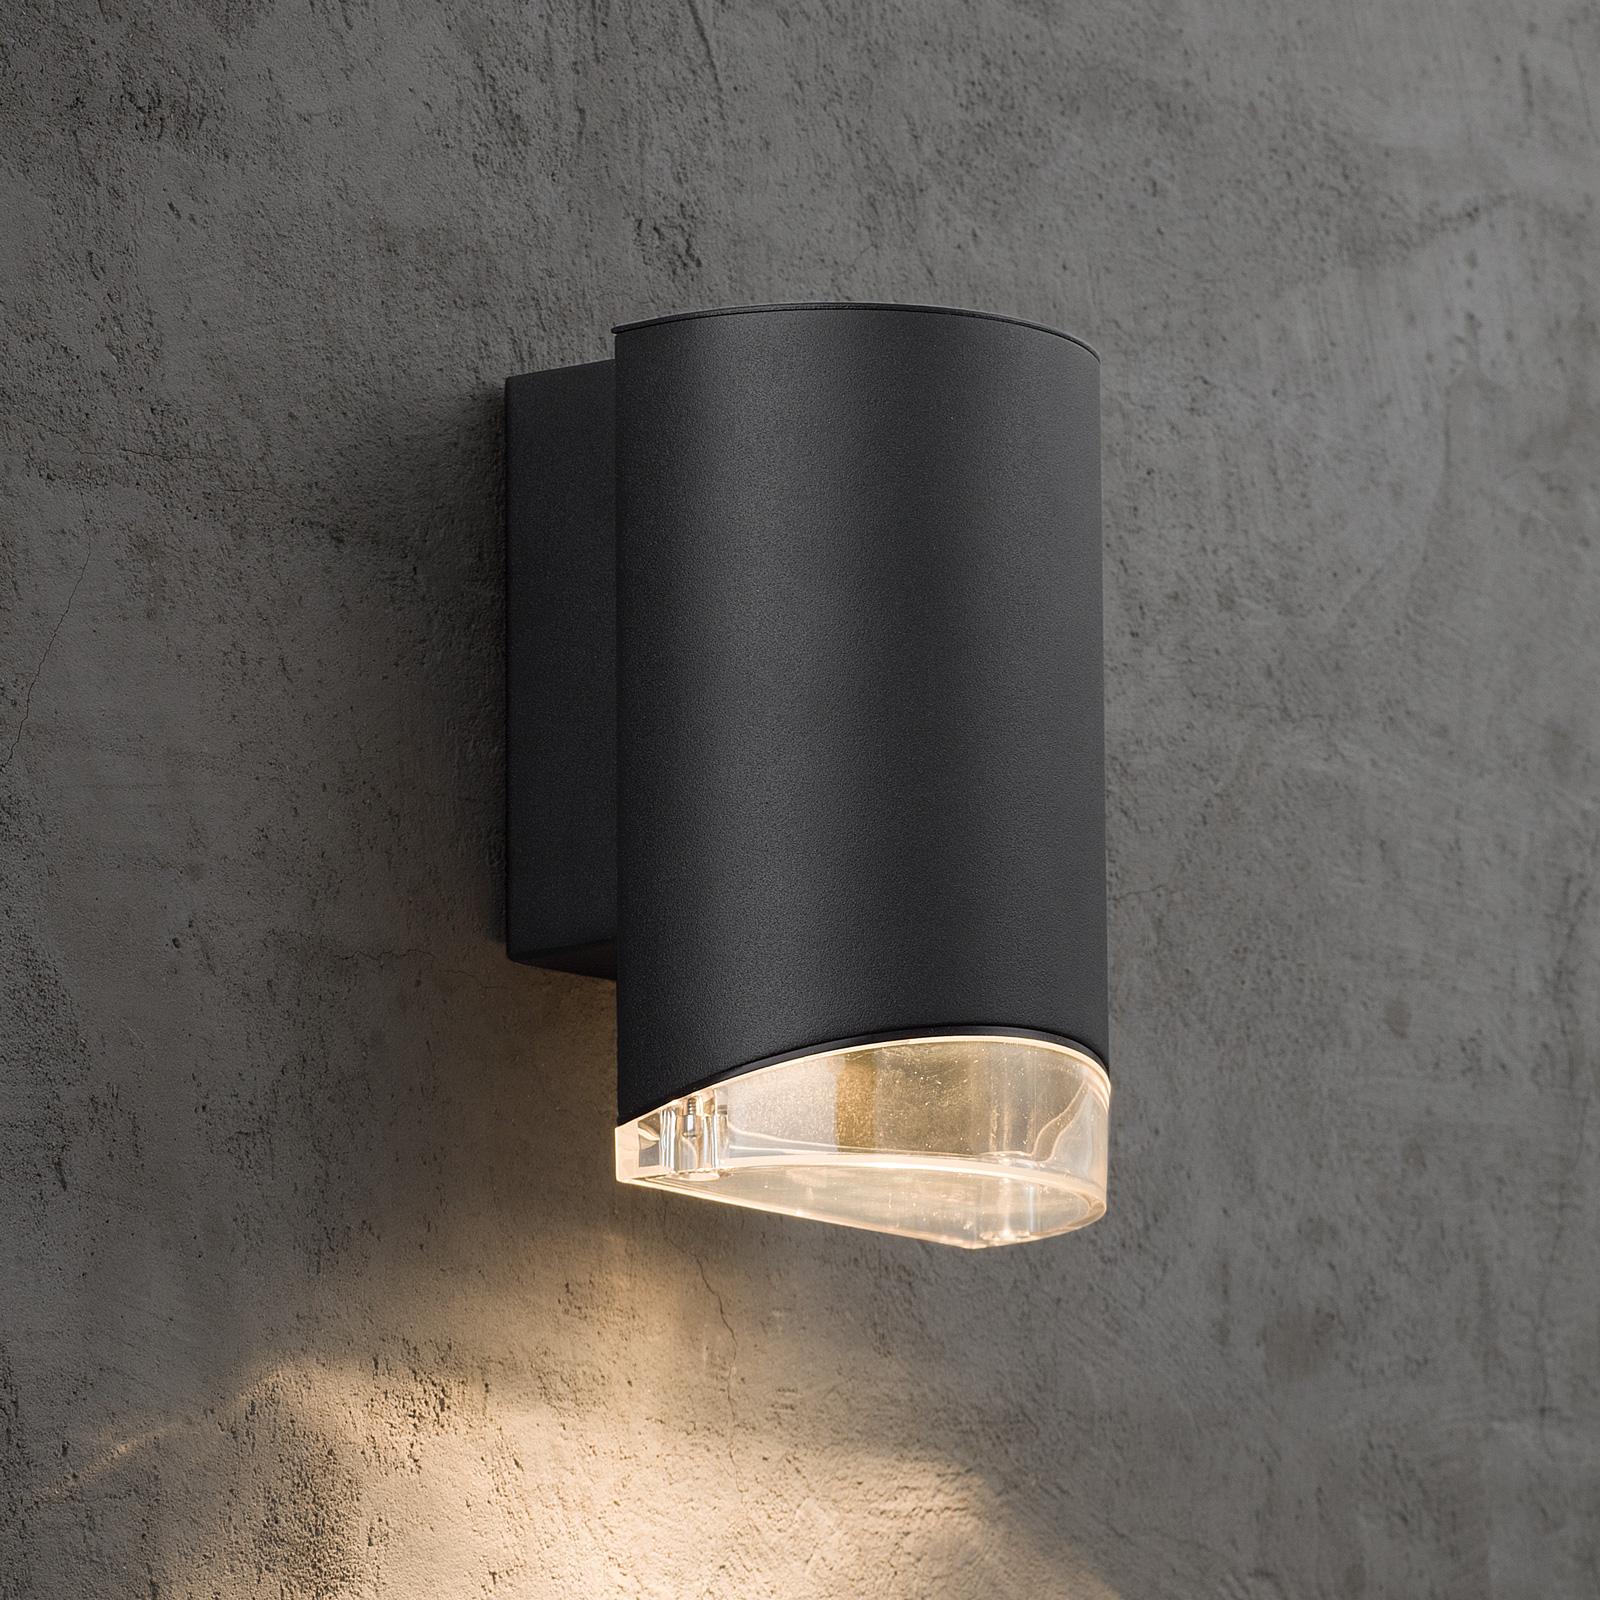 Buitenwandlamp Arn 1-lamp, zwart